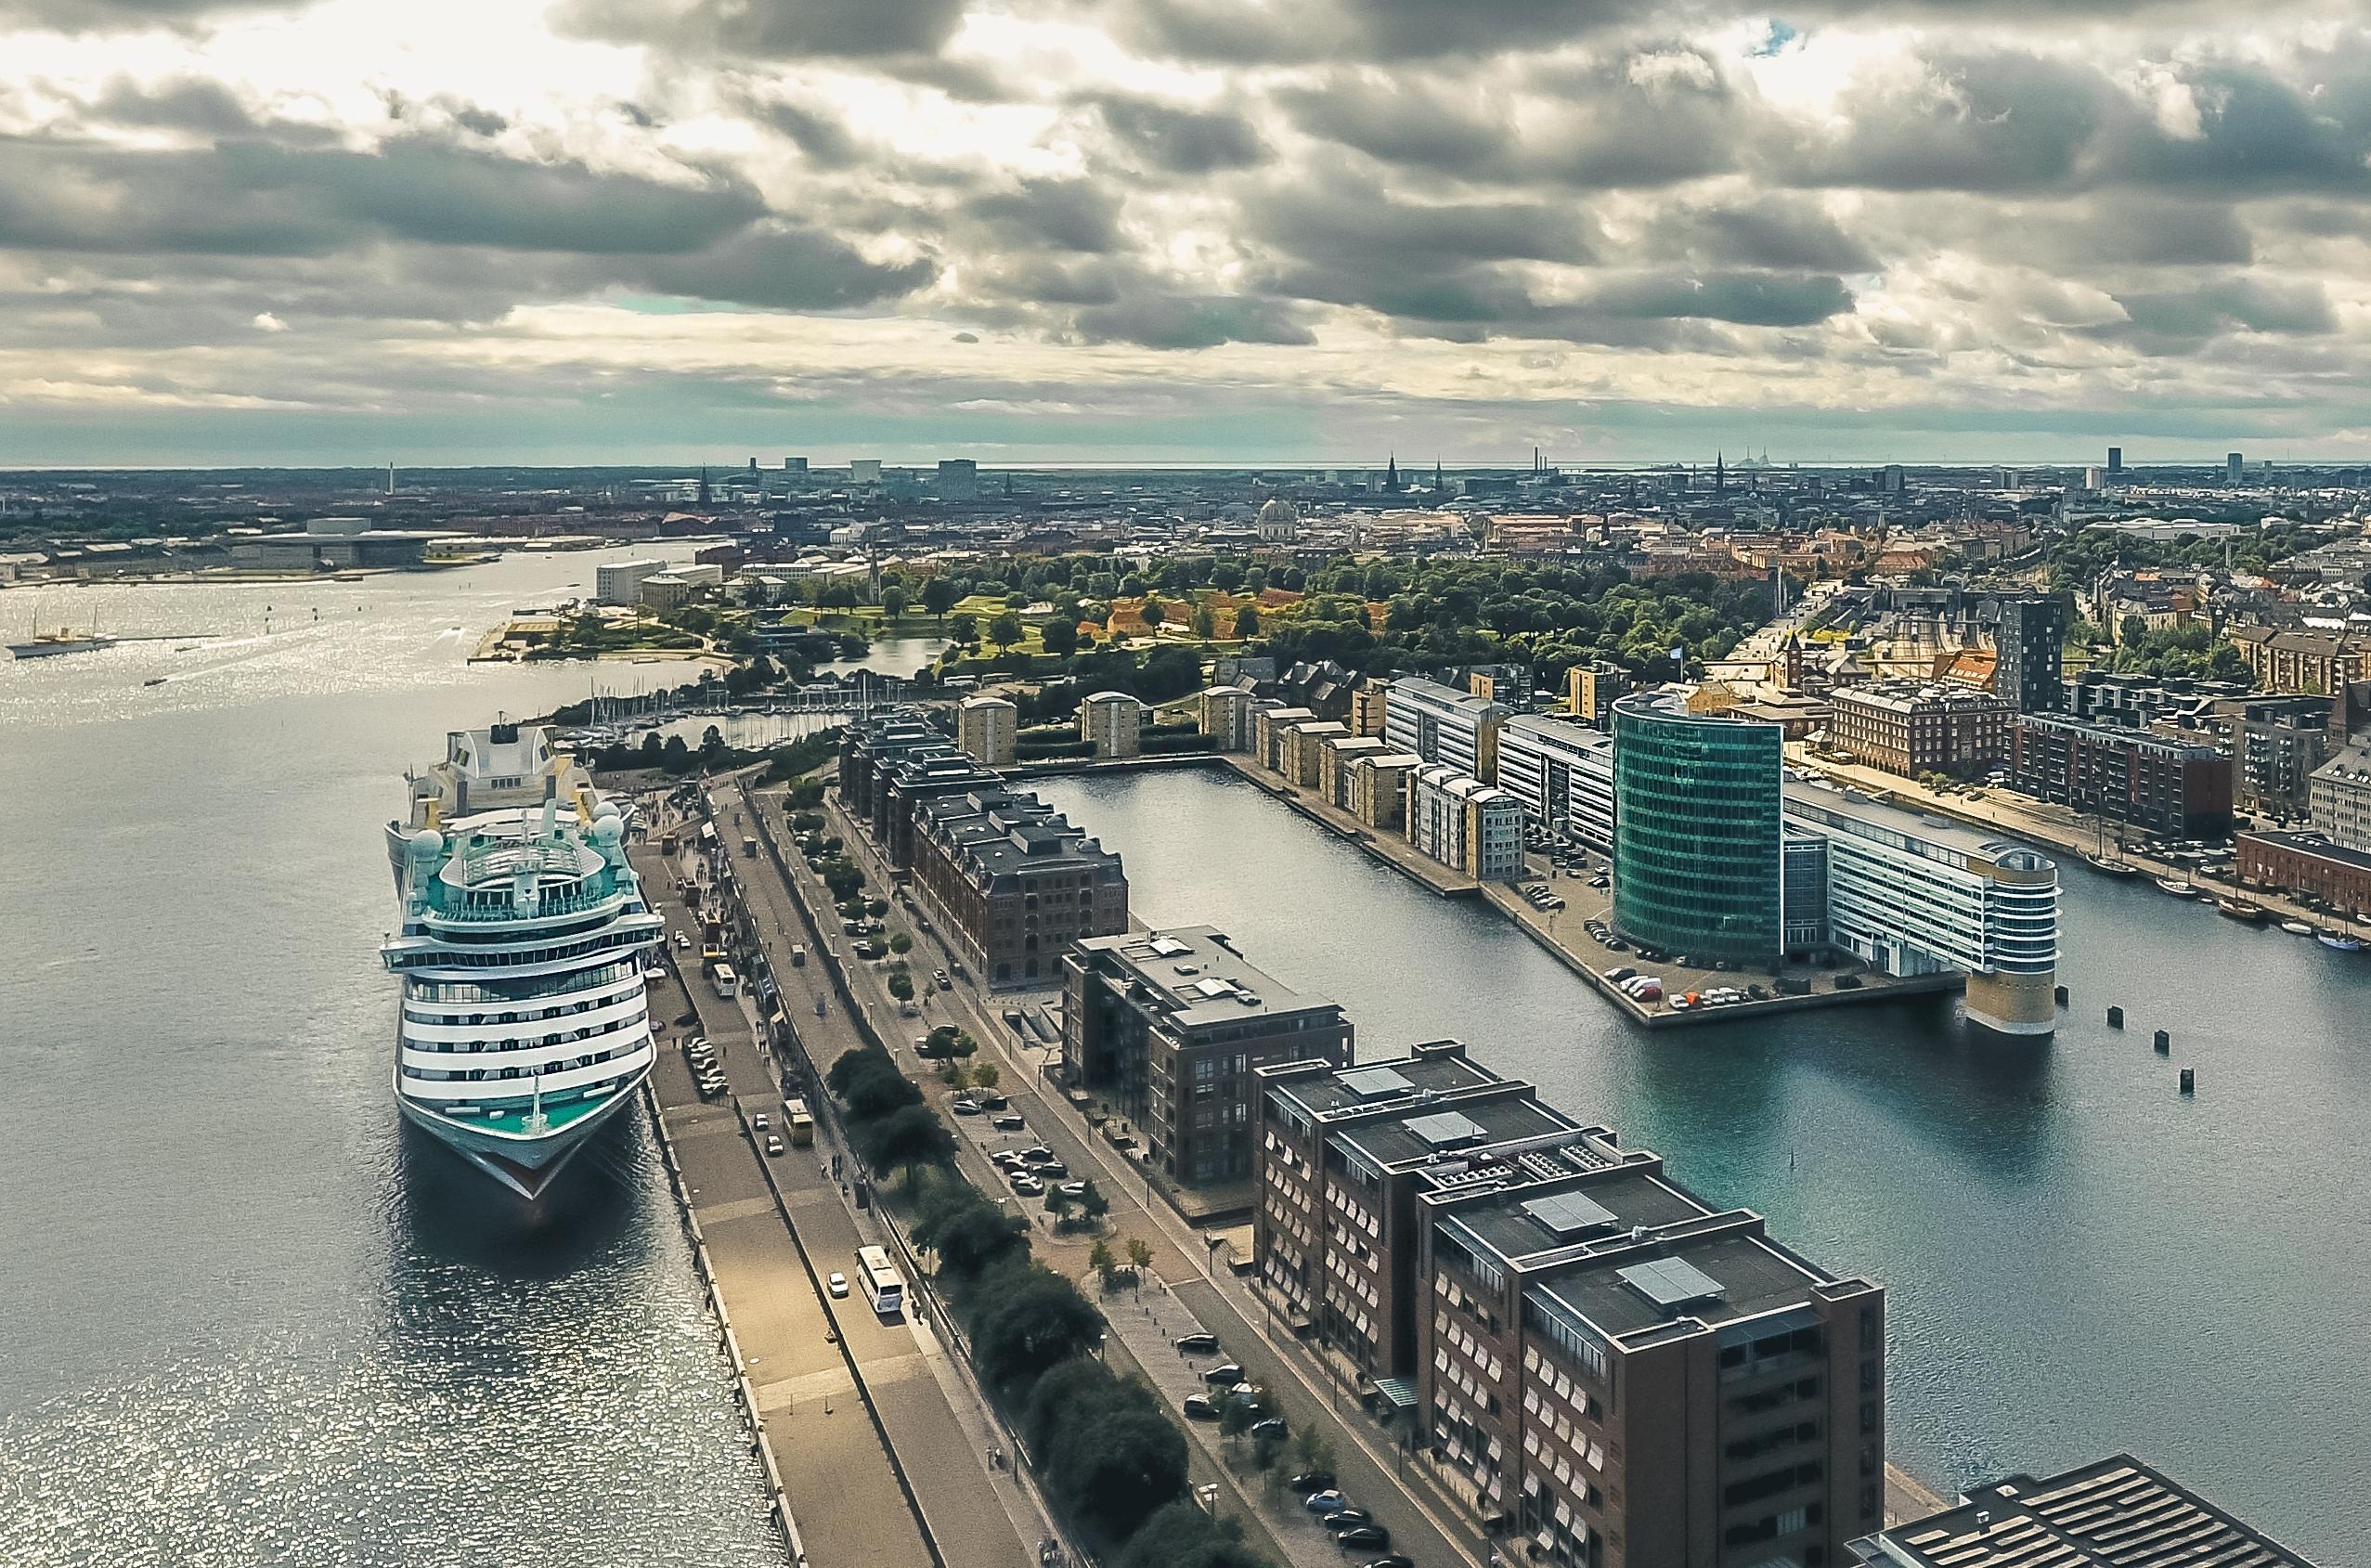 Krydstogtskib i Københavns Havn. Arkivfoto: Thomas Høyrup Christensen for Copenhagen Media Center, Wonderful Copenhagen.